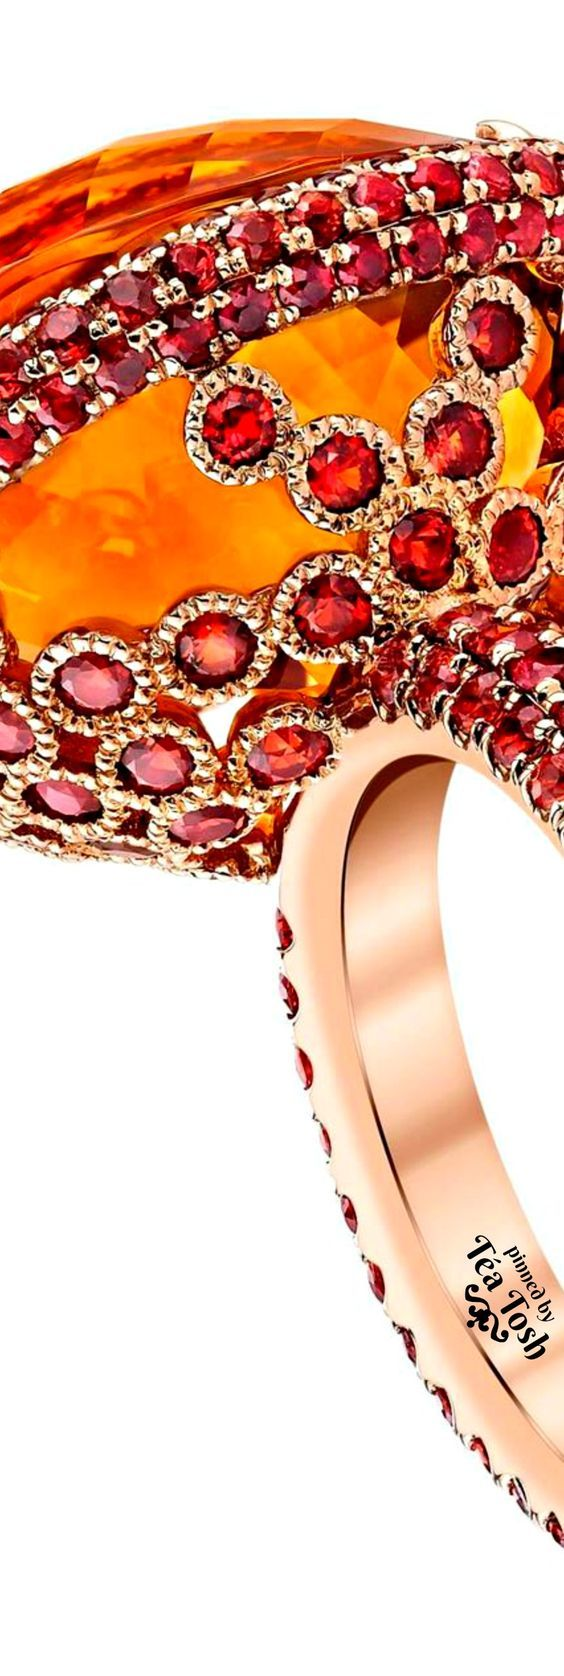 ❇Téa Tosh❇ Mandarin Orange Citrine and Orange Sapphires, set in Gold Ring